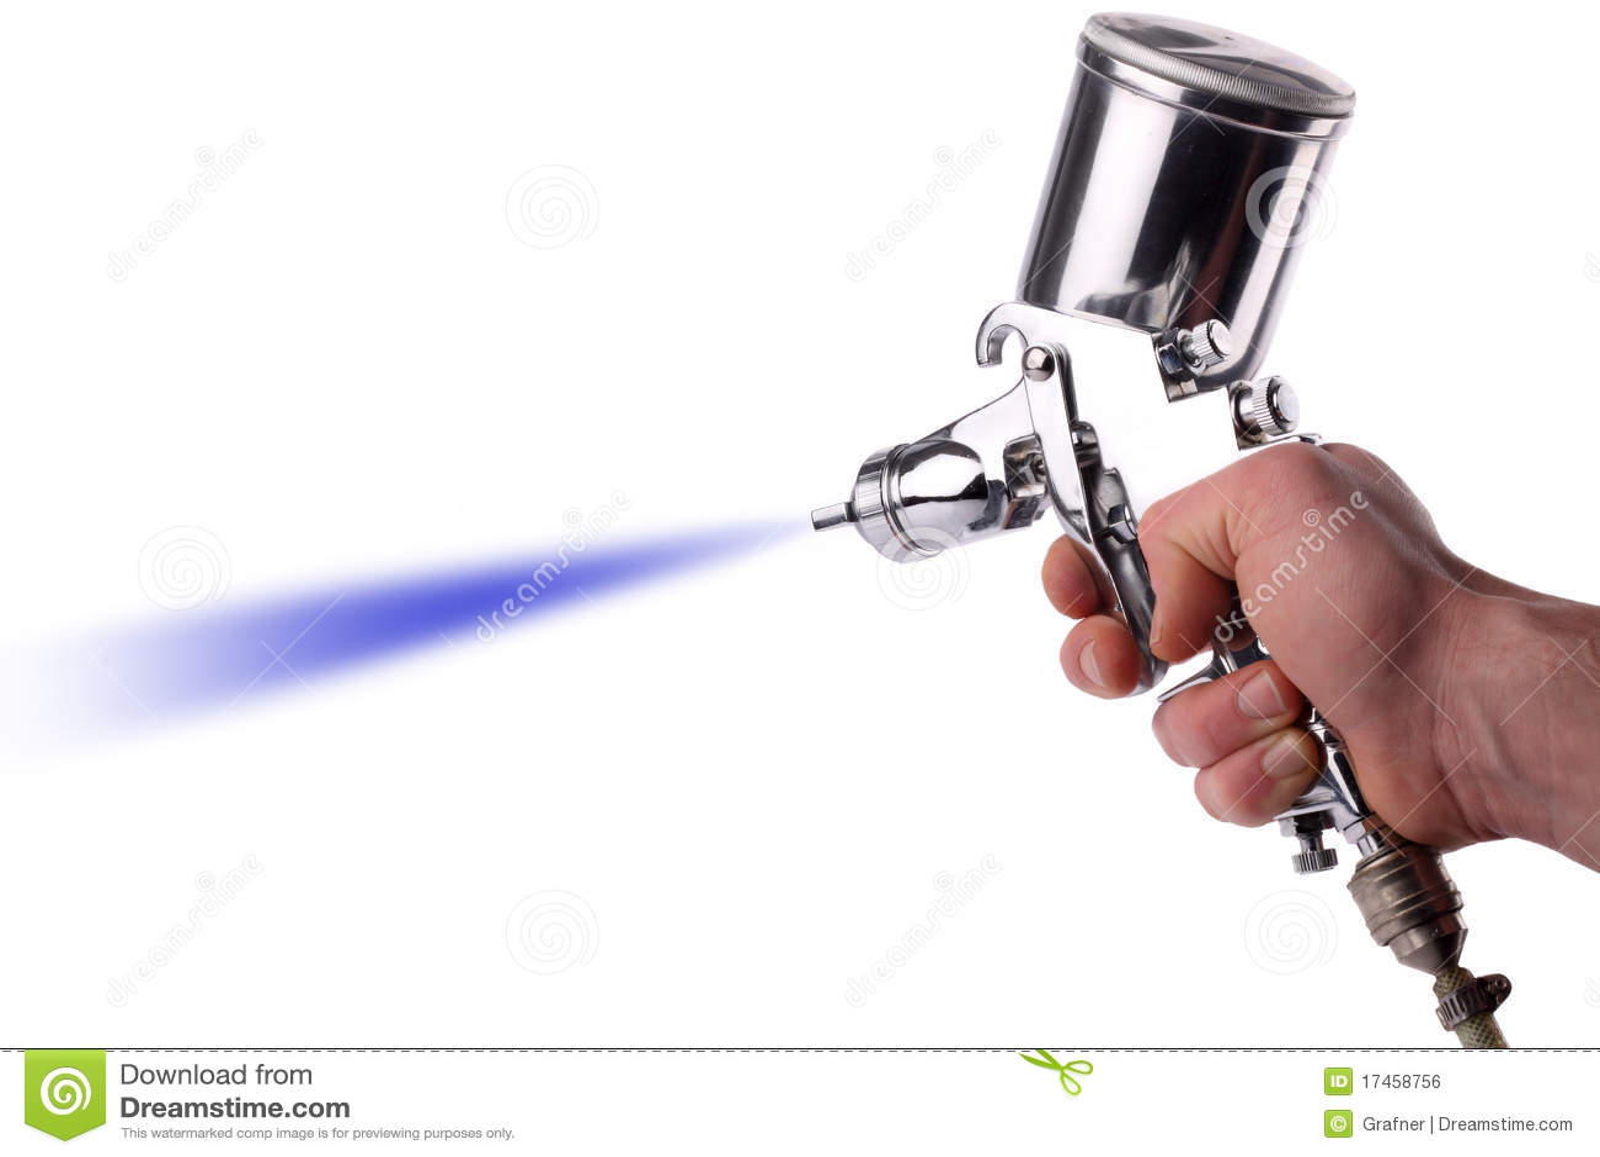 Spray gun stock photo image of repair workshop self - Pistola de pintar ...